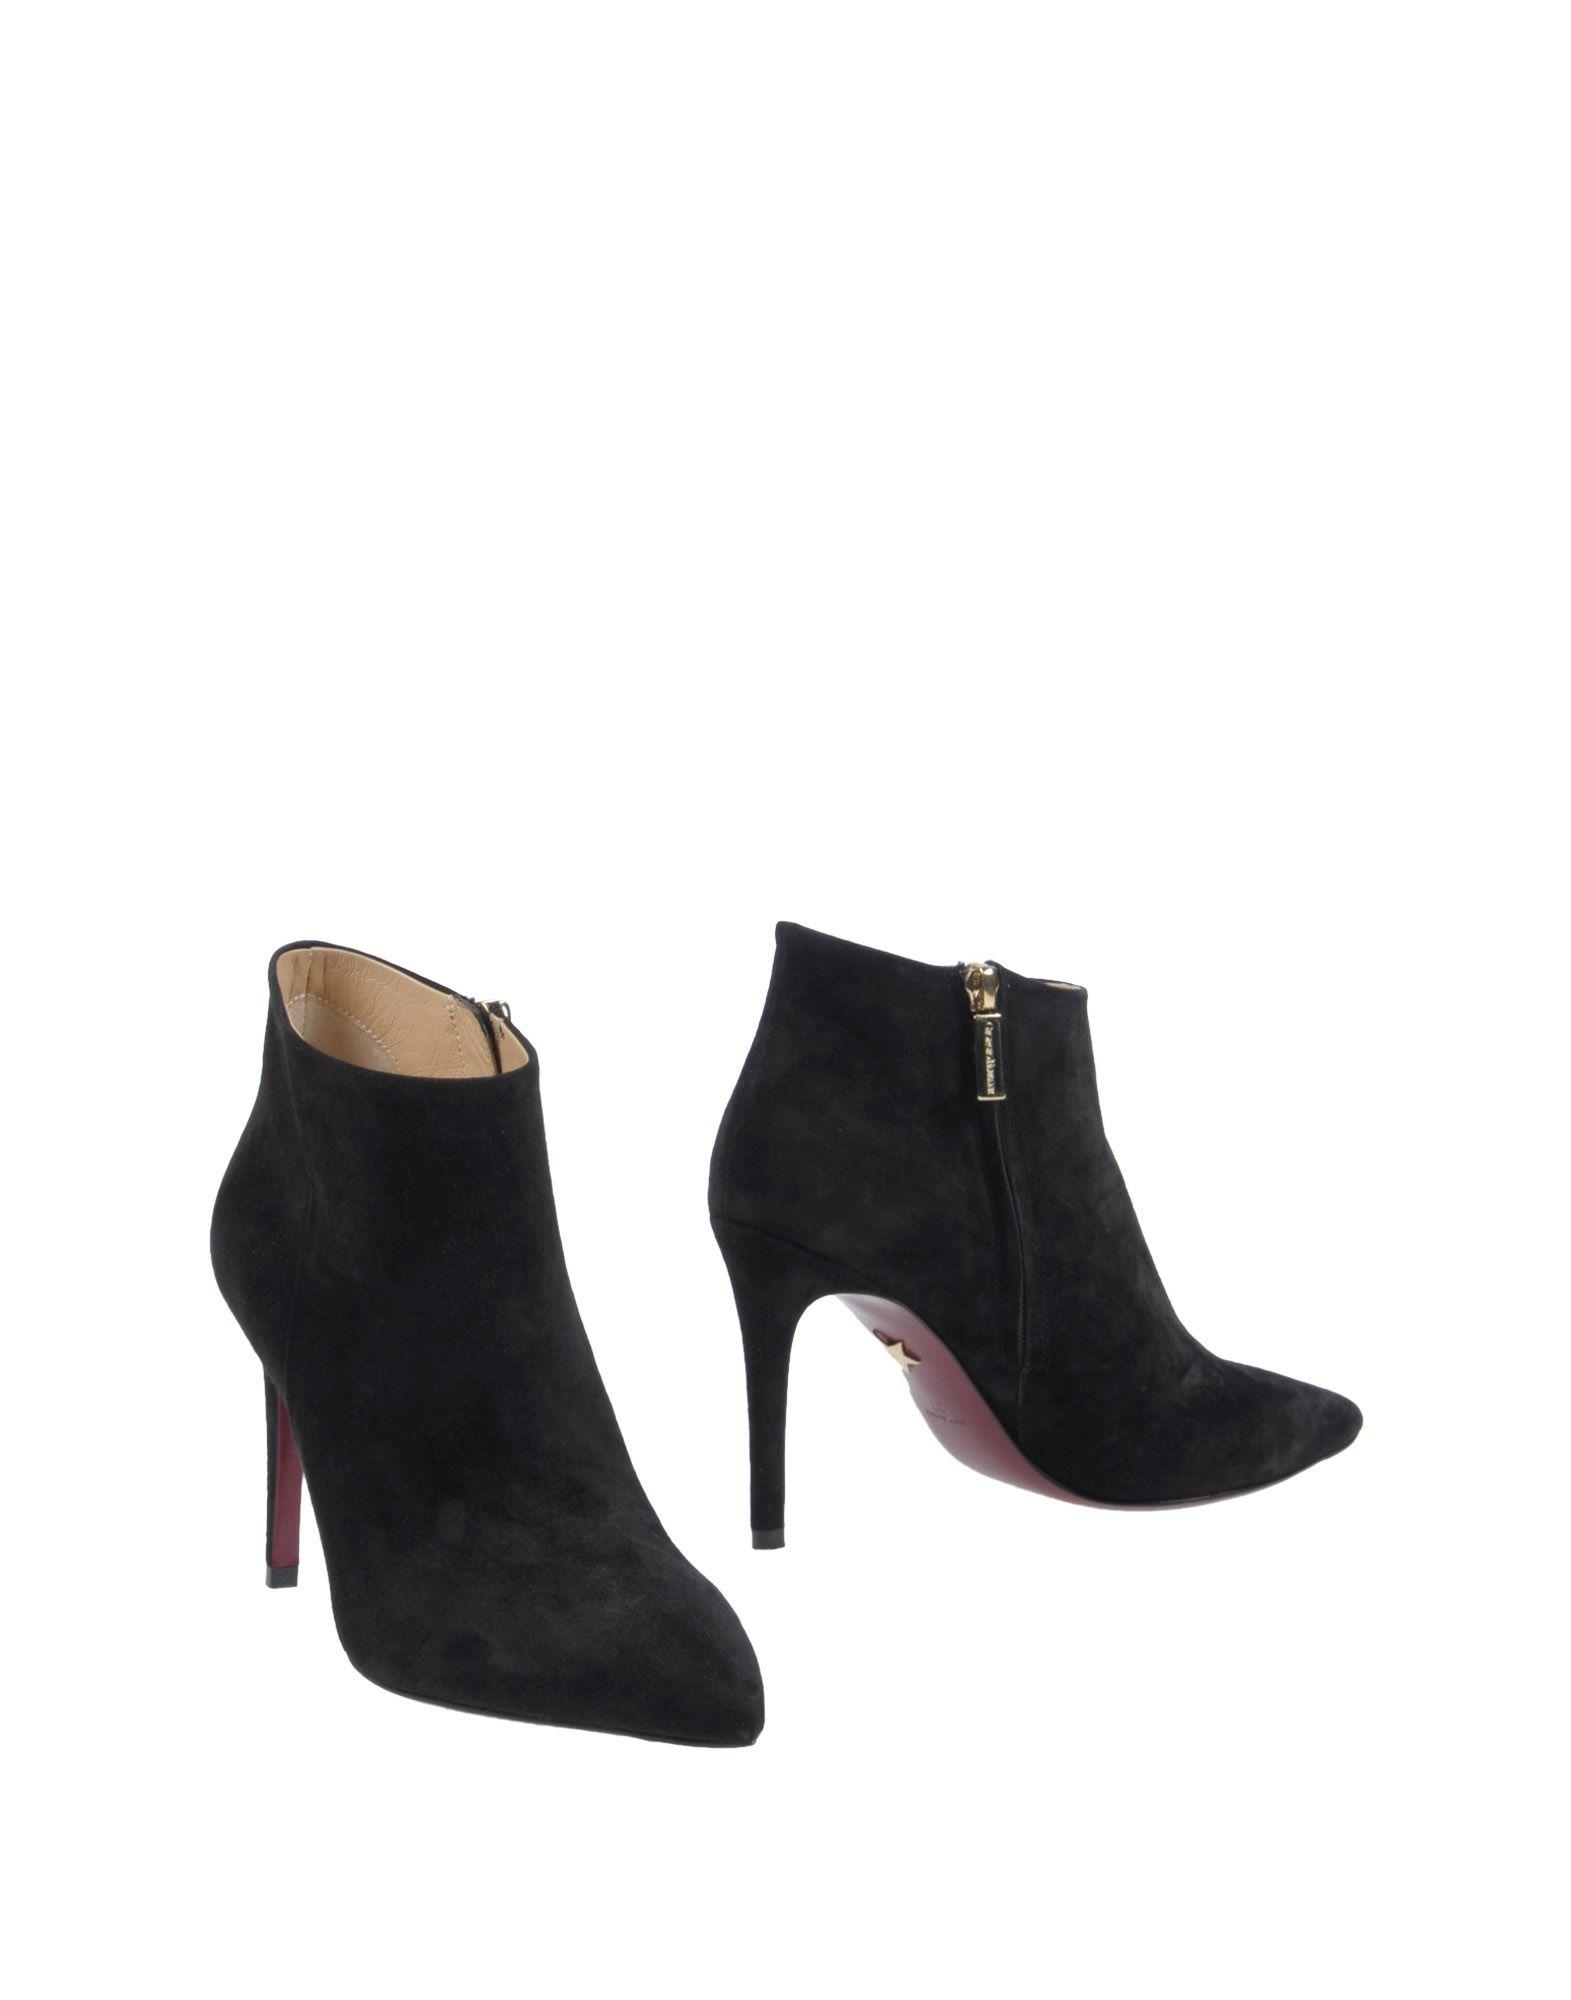 Stilvolle billige Schuhe Damen Giorgio Fabiani Stiefelette Damen Schuhe  11445142DQ 4bc53b